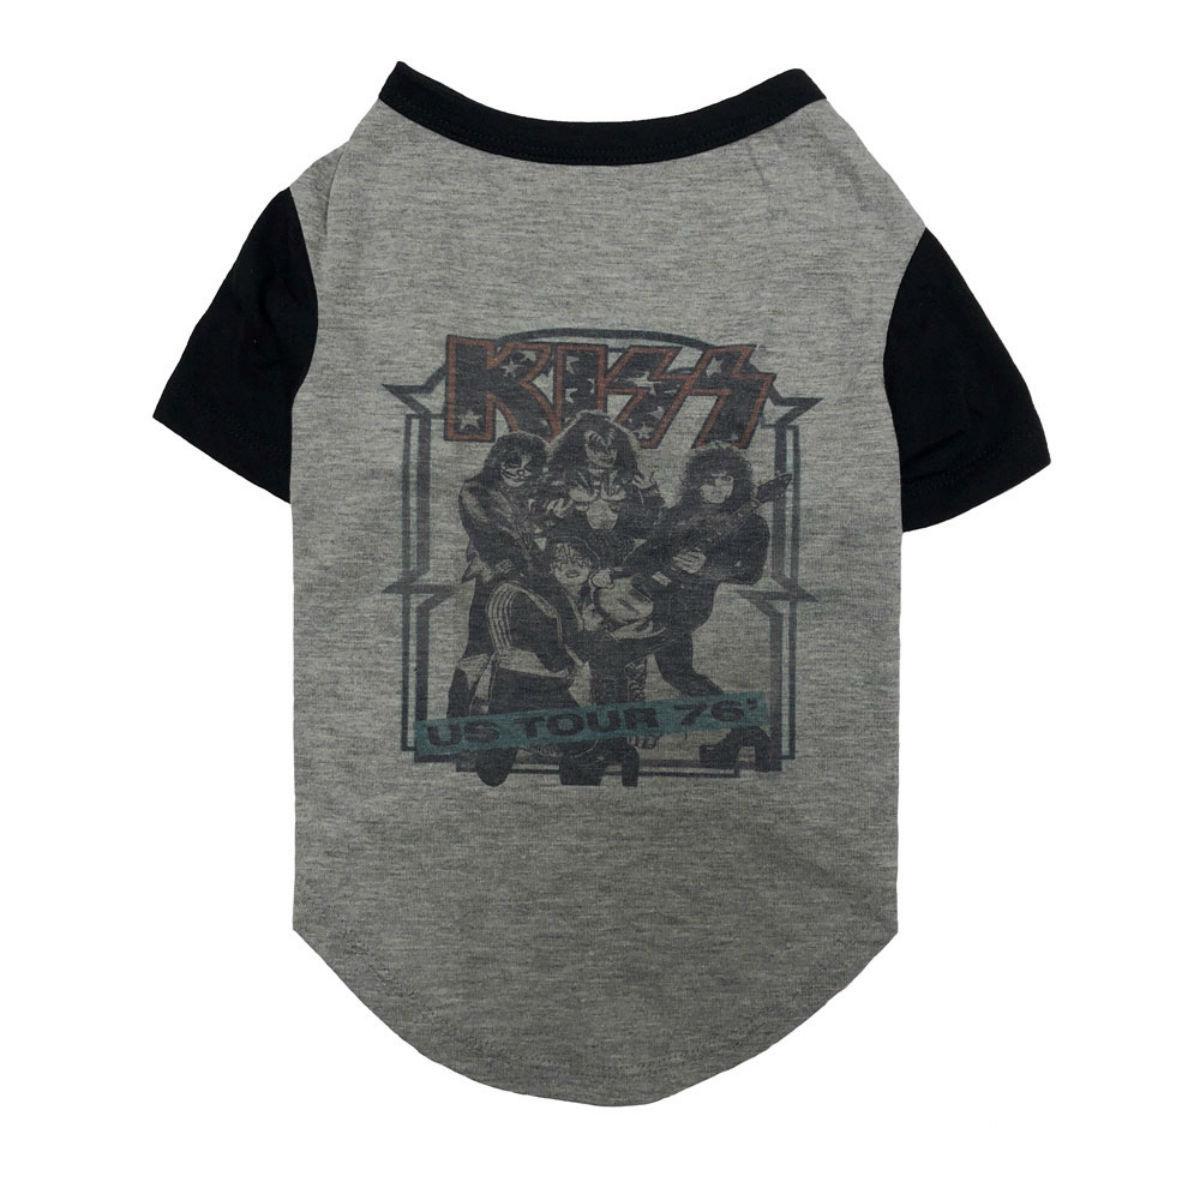 fabdog® KISS '76 Tour Dog T-Shirt - Gray